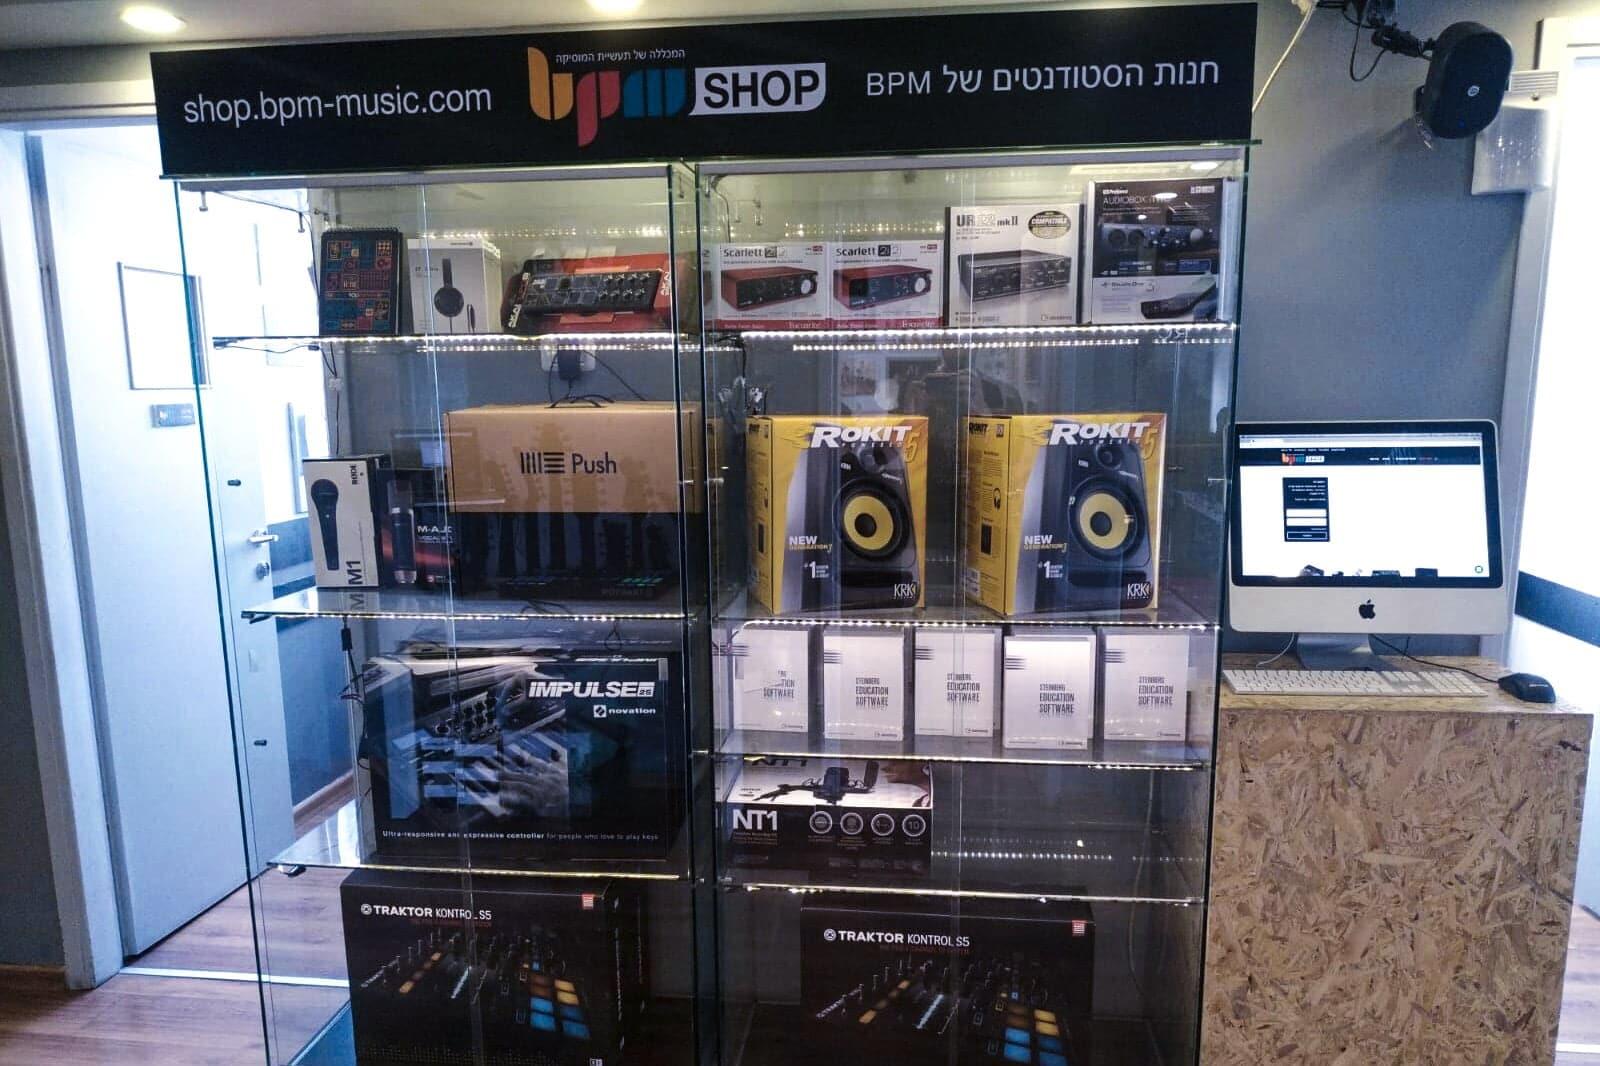 BPMSHOP, חנות הסטודנטים והבוגרים - מכללת BPM